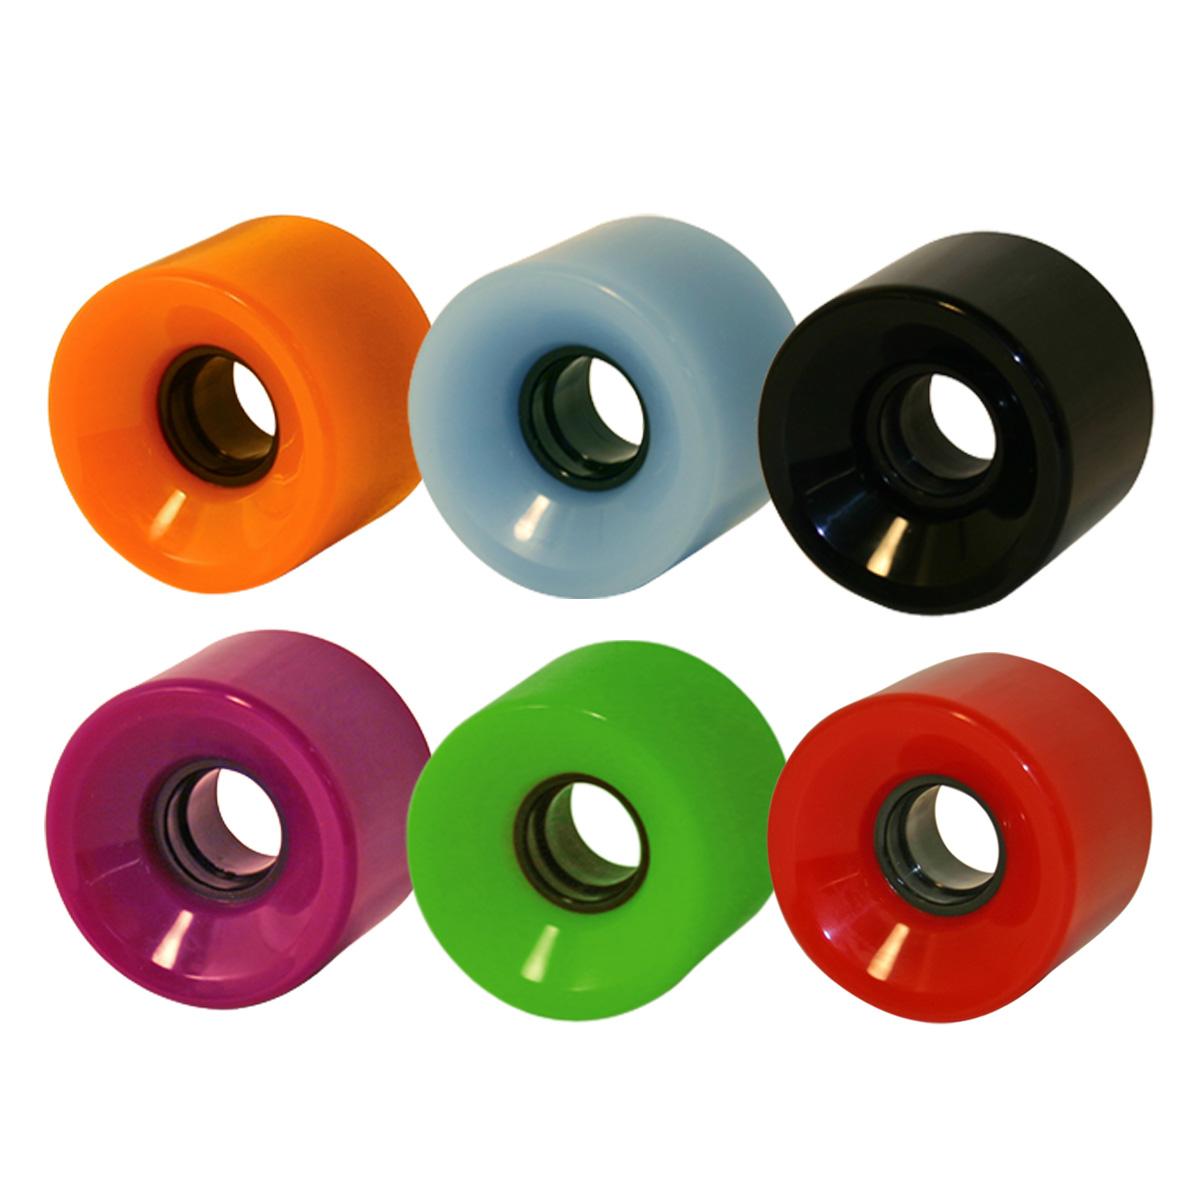 Cruiser Blank Wheels - 60mm, 65mm, 70mm, 76mm  78A w/hub. Orange, Blue, Black, Purple, Green, Red